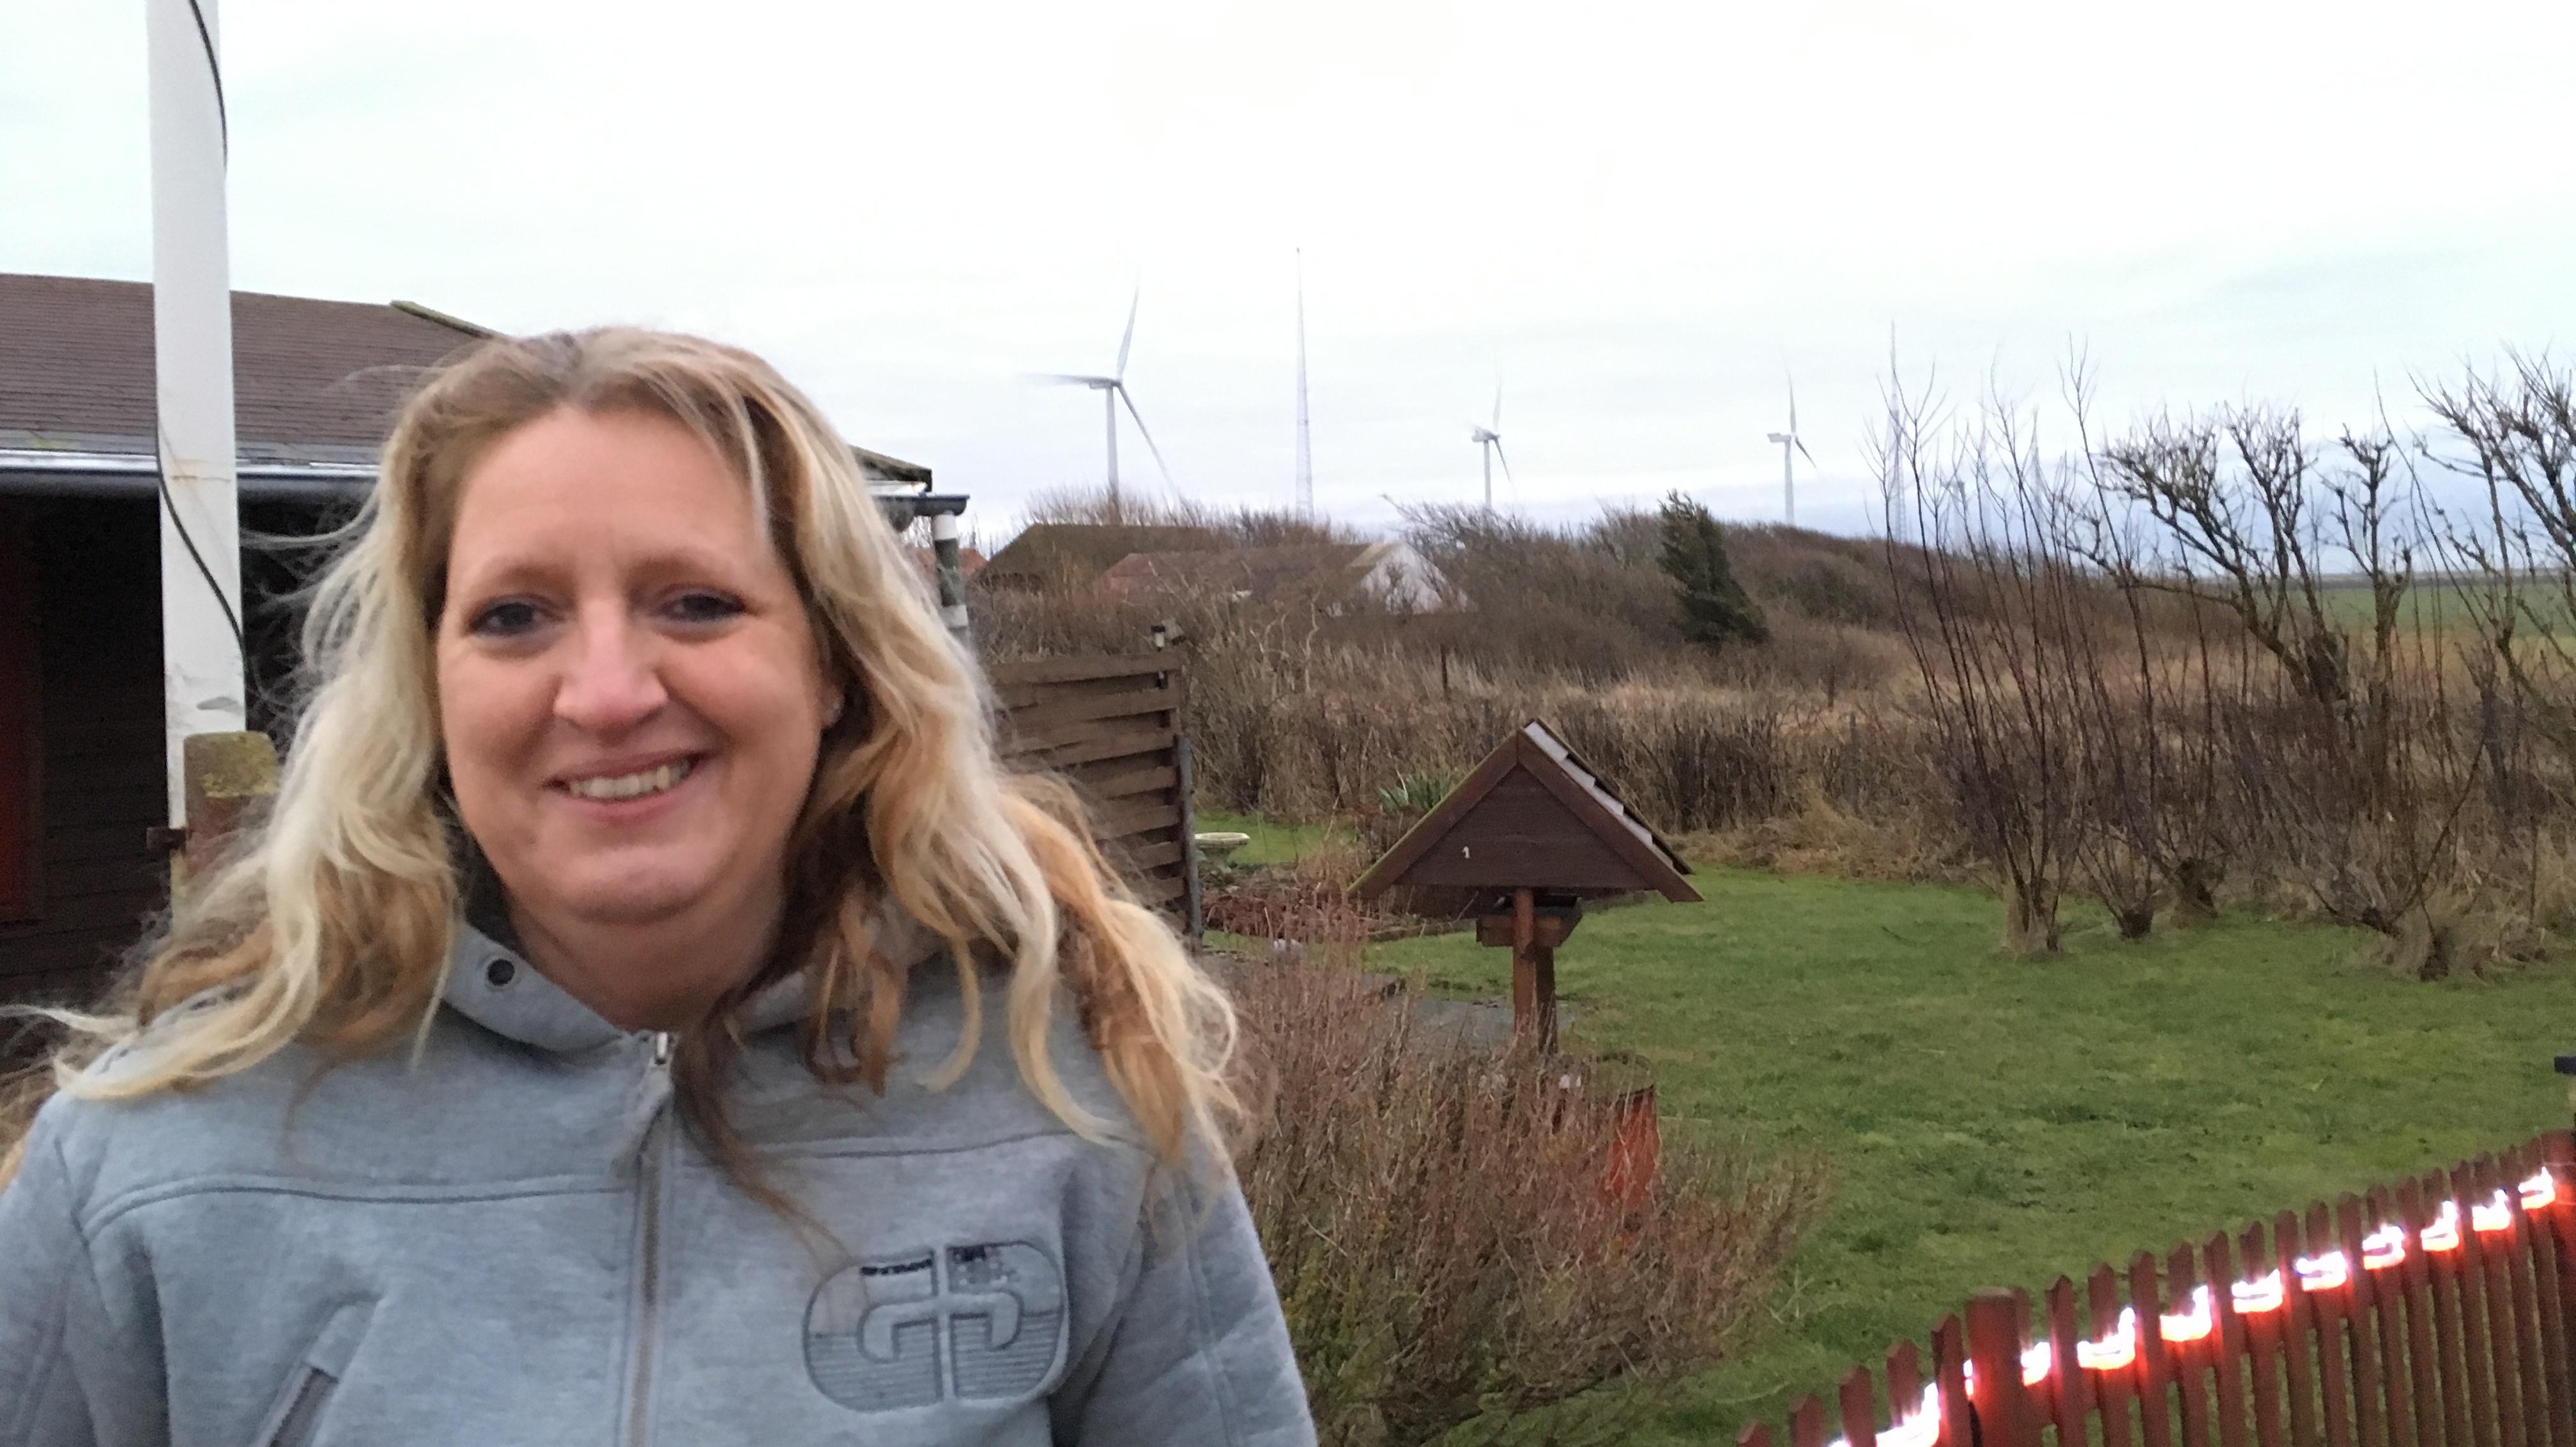 Pia Boje, nabo til testcenter Høvsøre